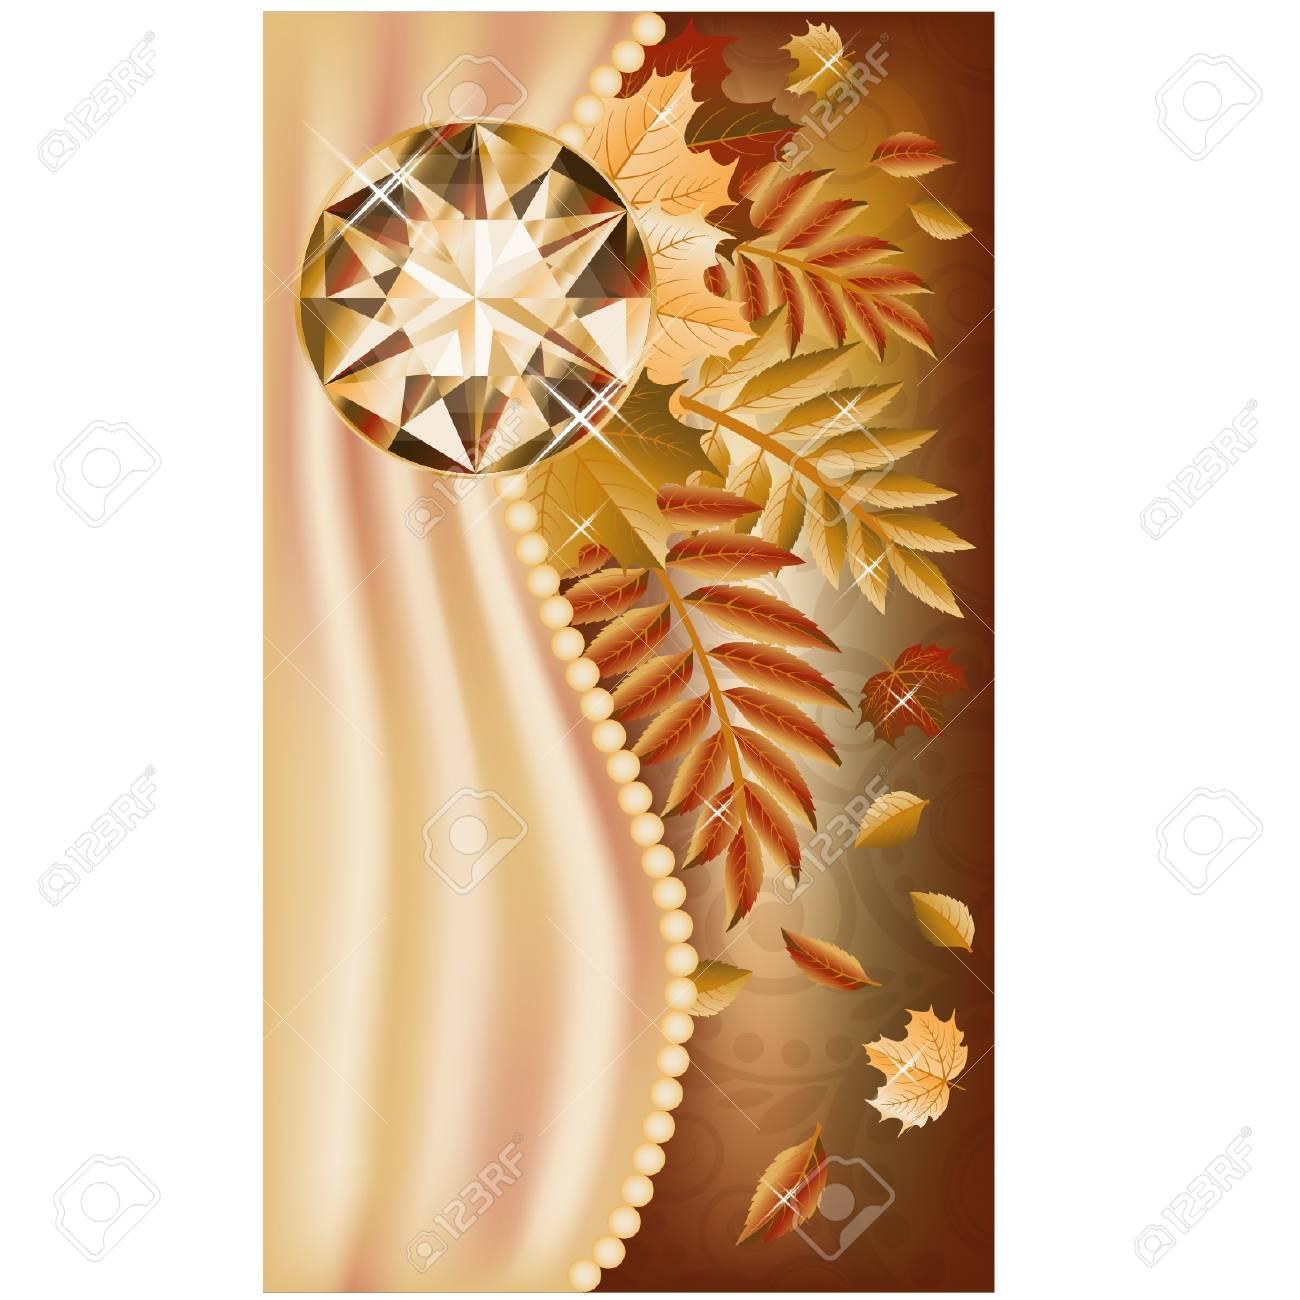 Autumn greeting card with precious gemstone, vector illustration Stock Vector - 21635368